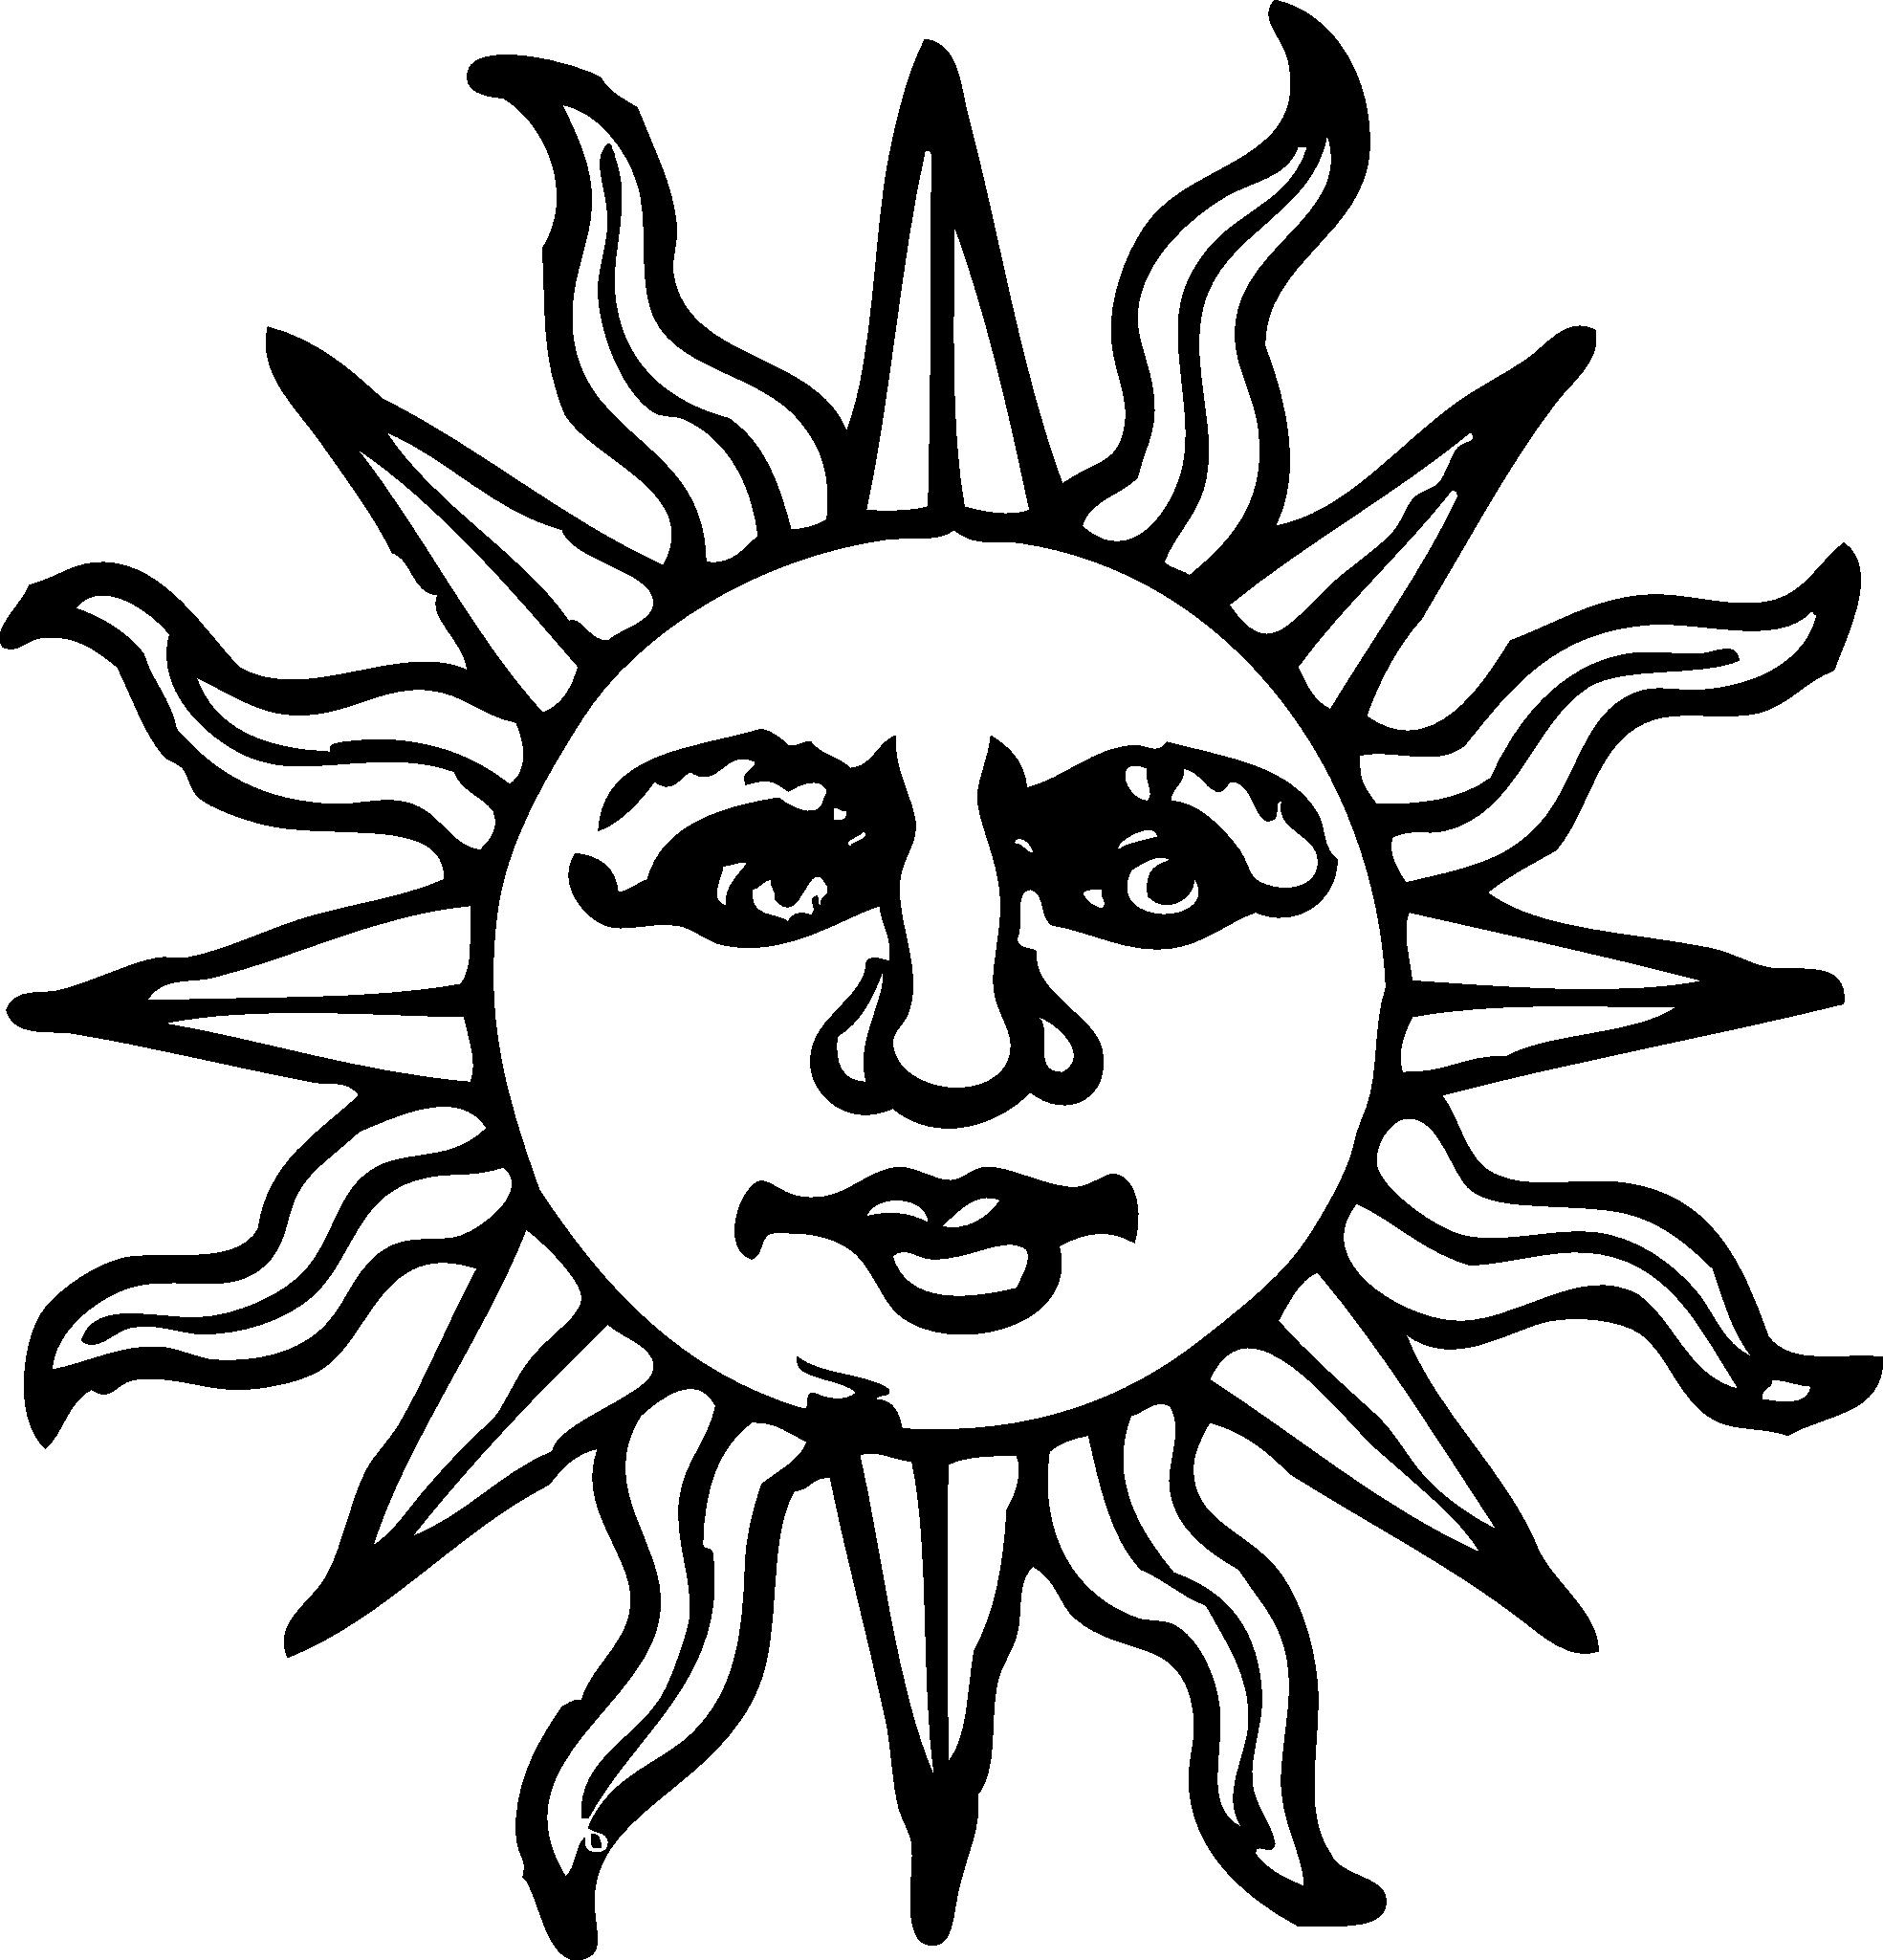 png transparent stock Sunburst clipart black and white. Sun woodcut line art